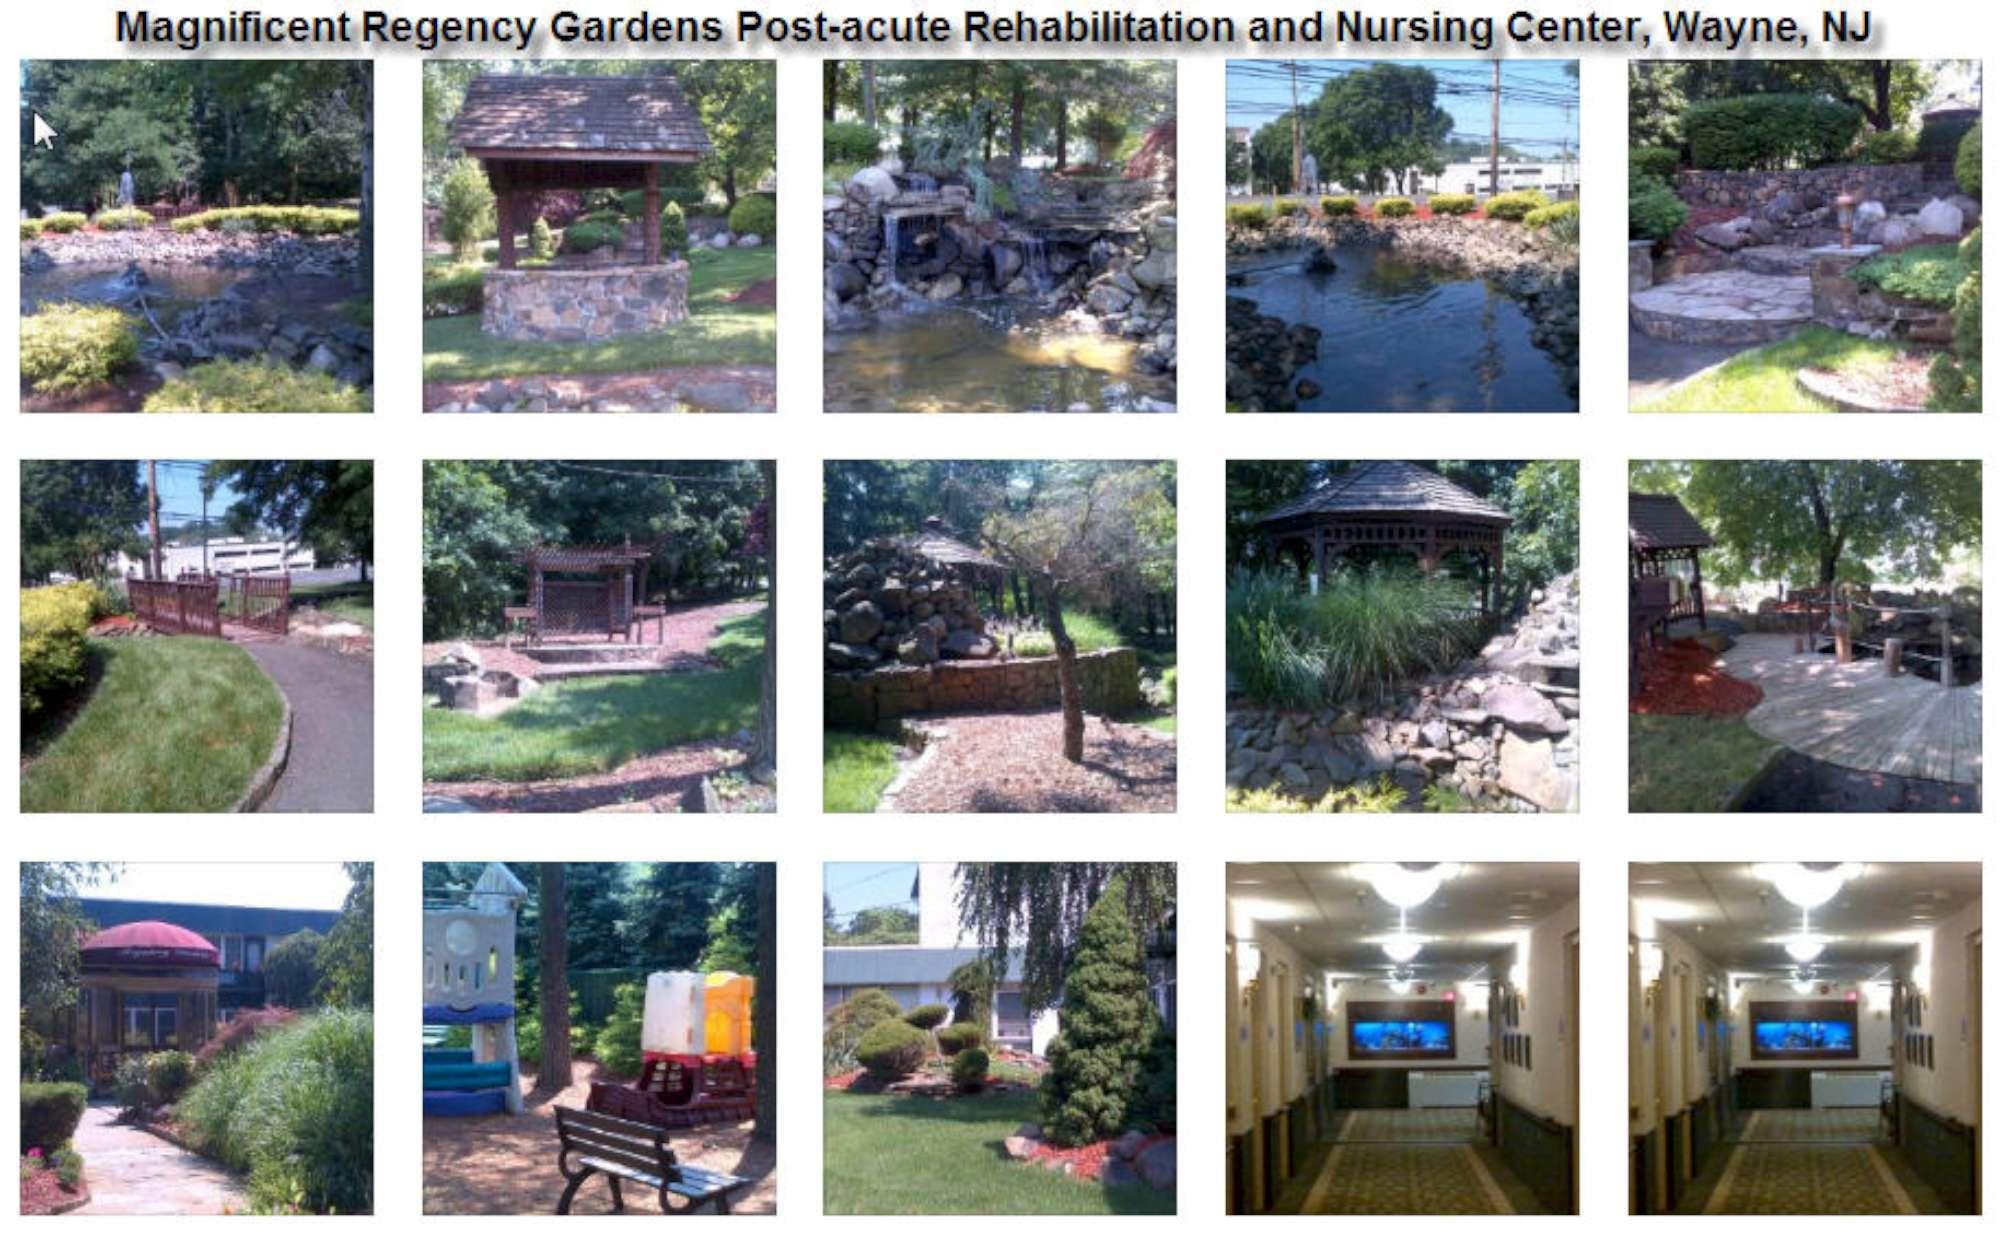 High Quality Regency Gardens Collage